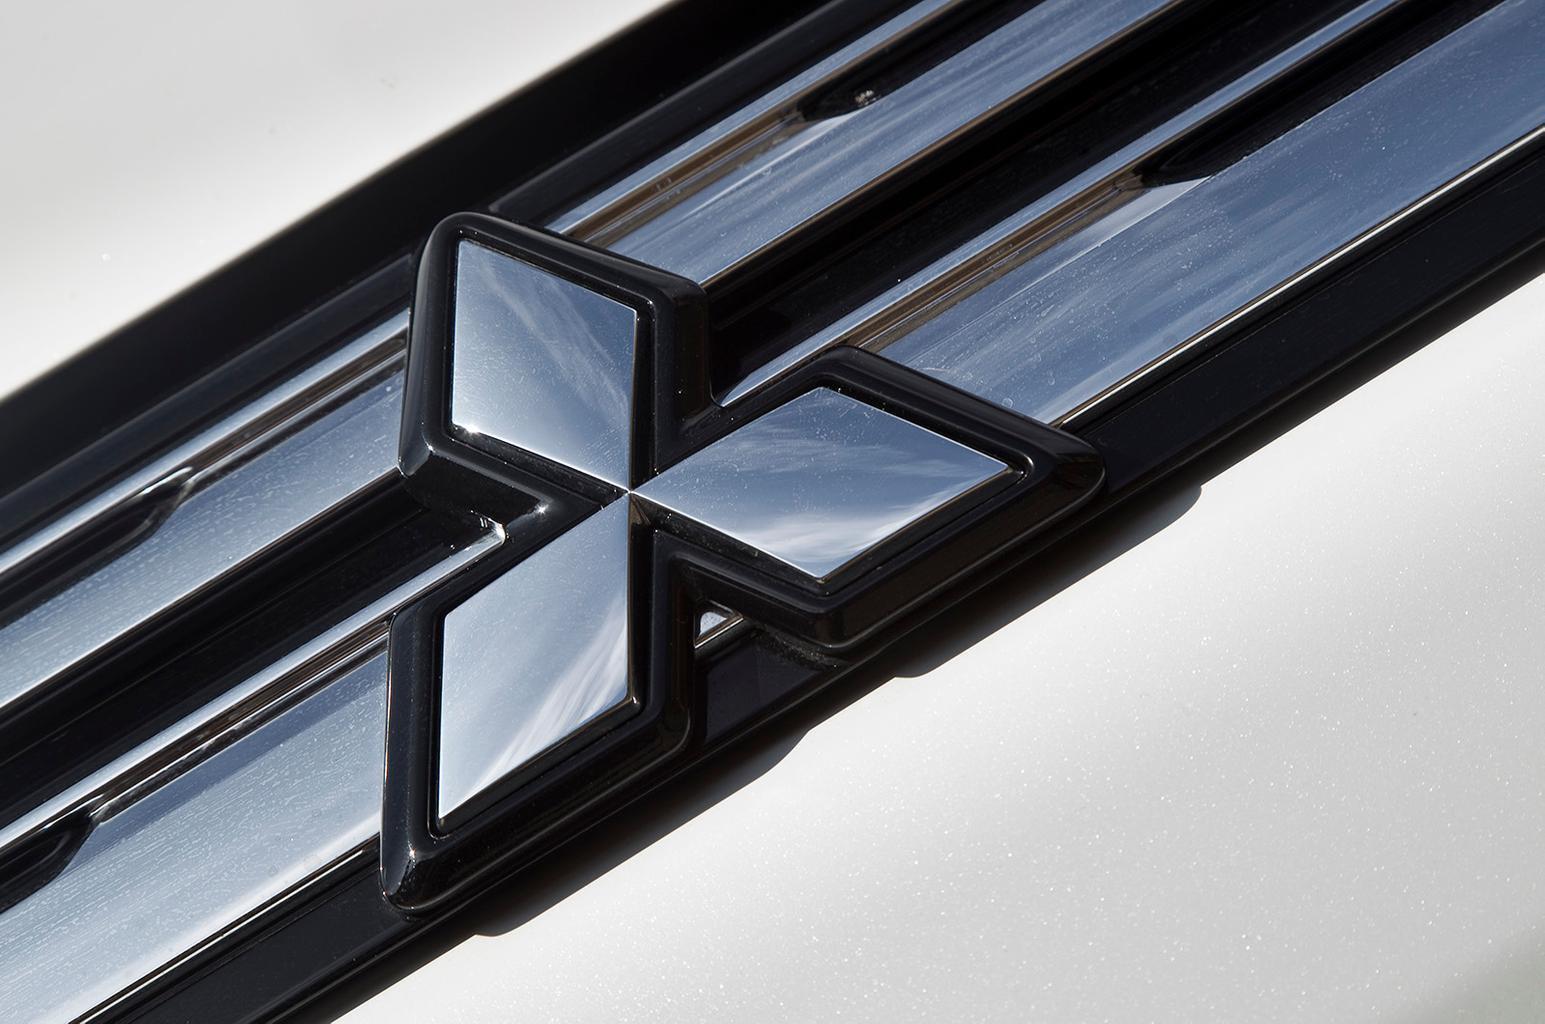 Mitsubishi fuel economy scandal: no UK cars affected